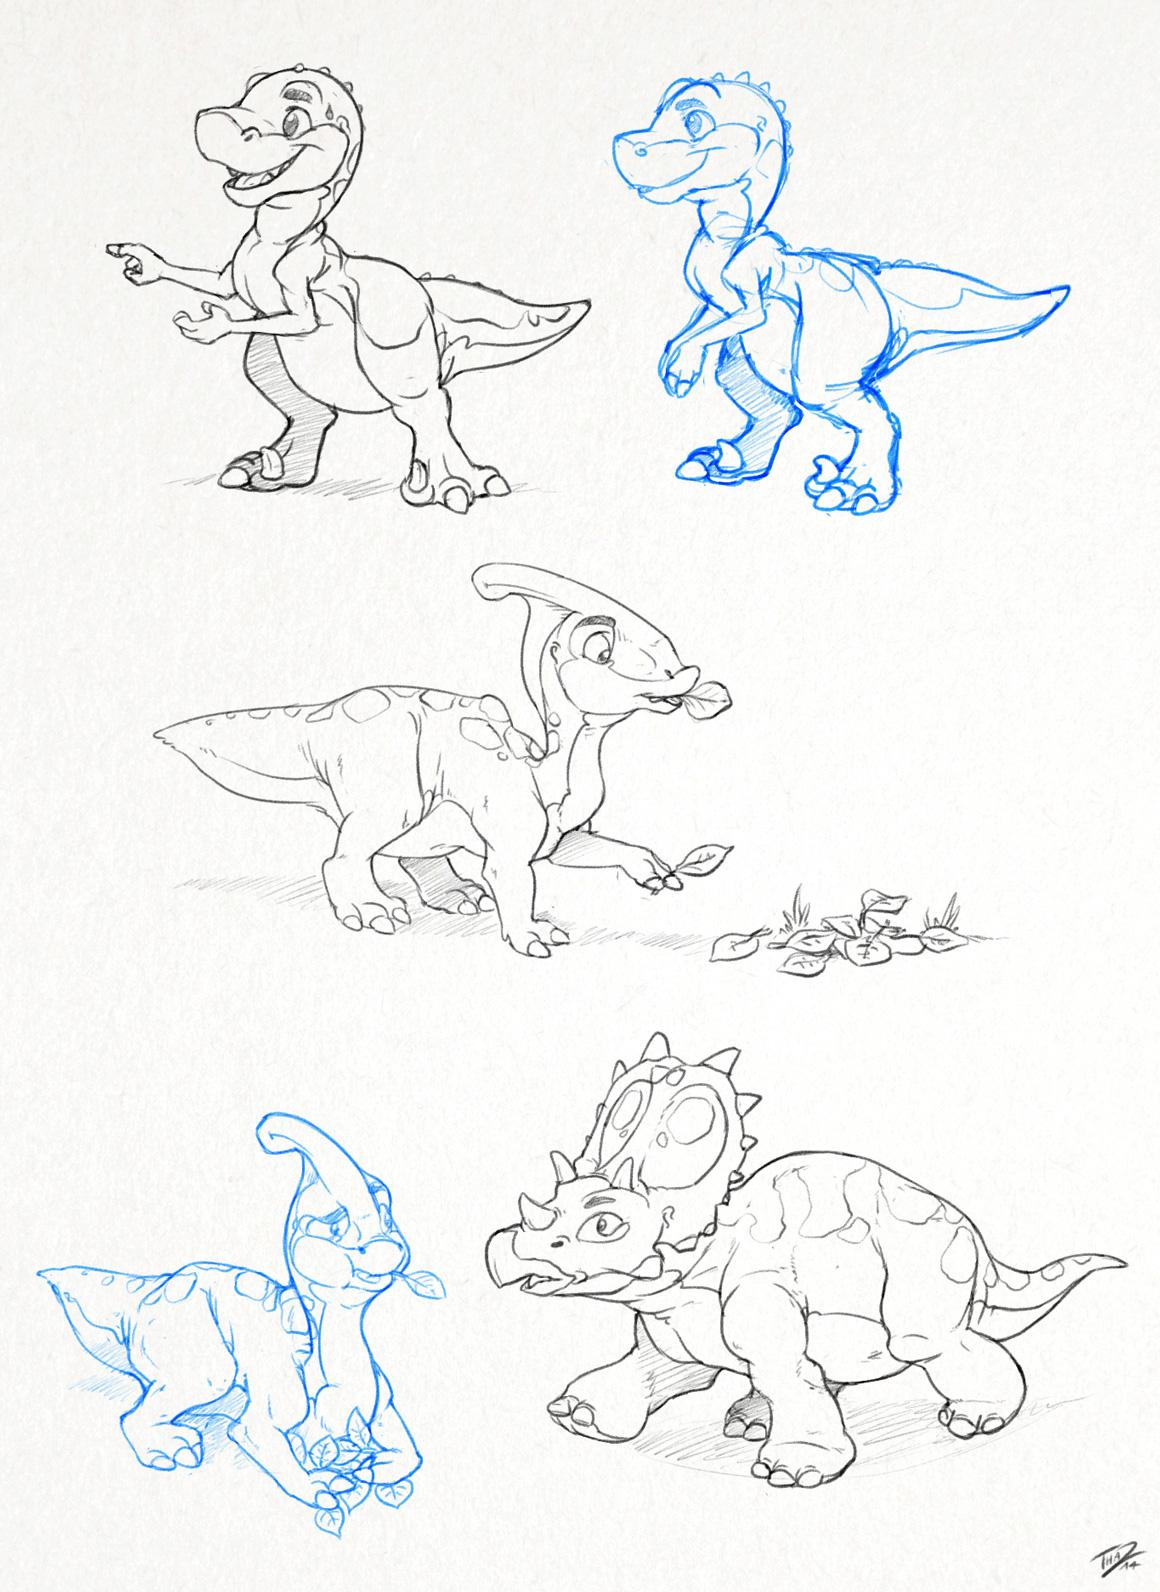 More Dinosaur Sketches by thazumi